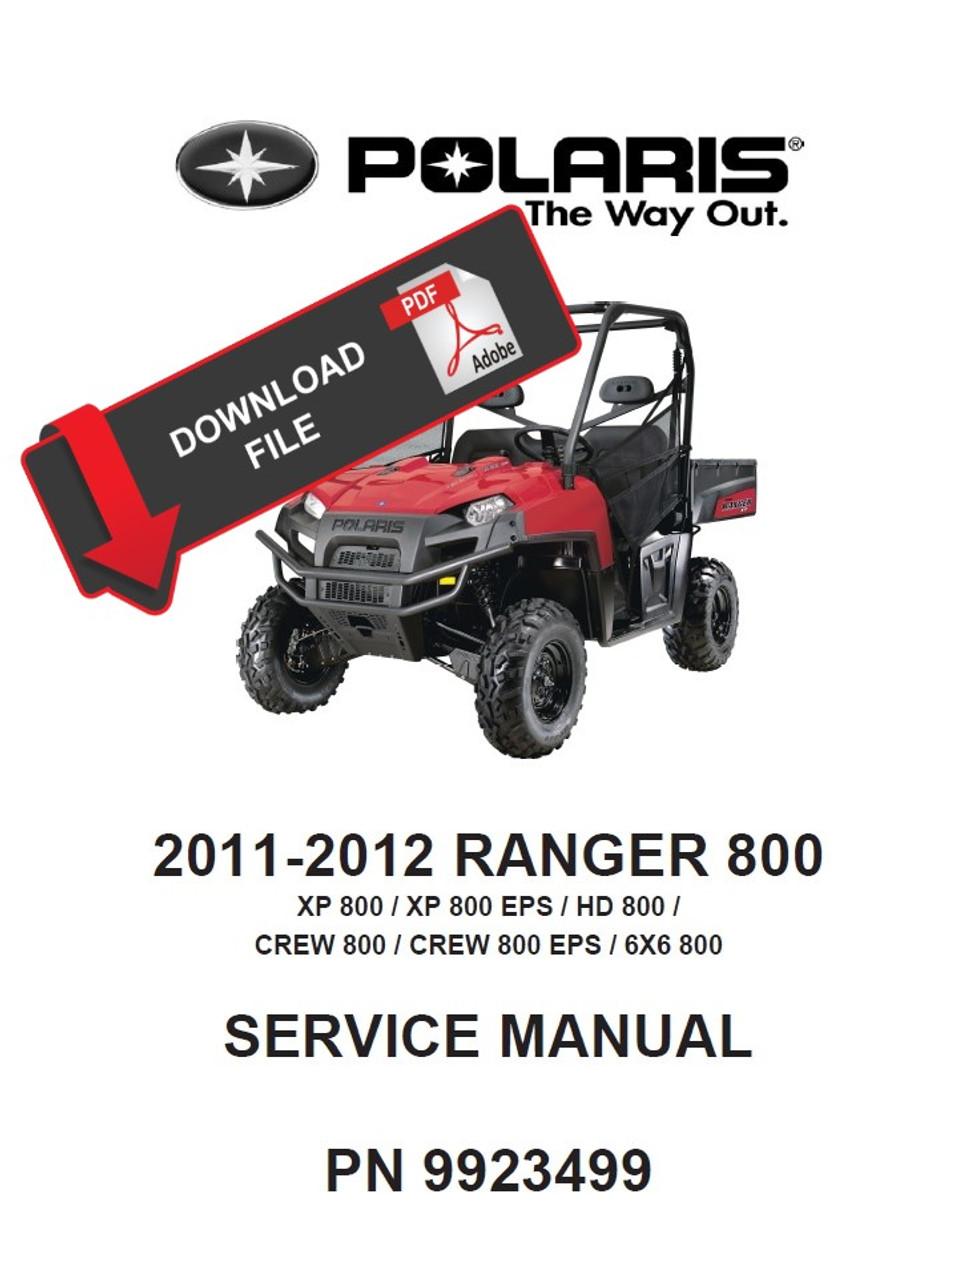 2008 polaris ranger 6x6 700 efi service repair manual.